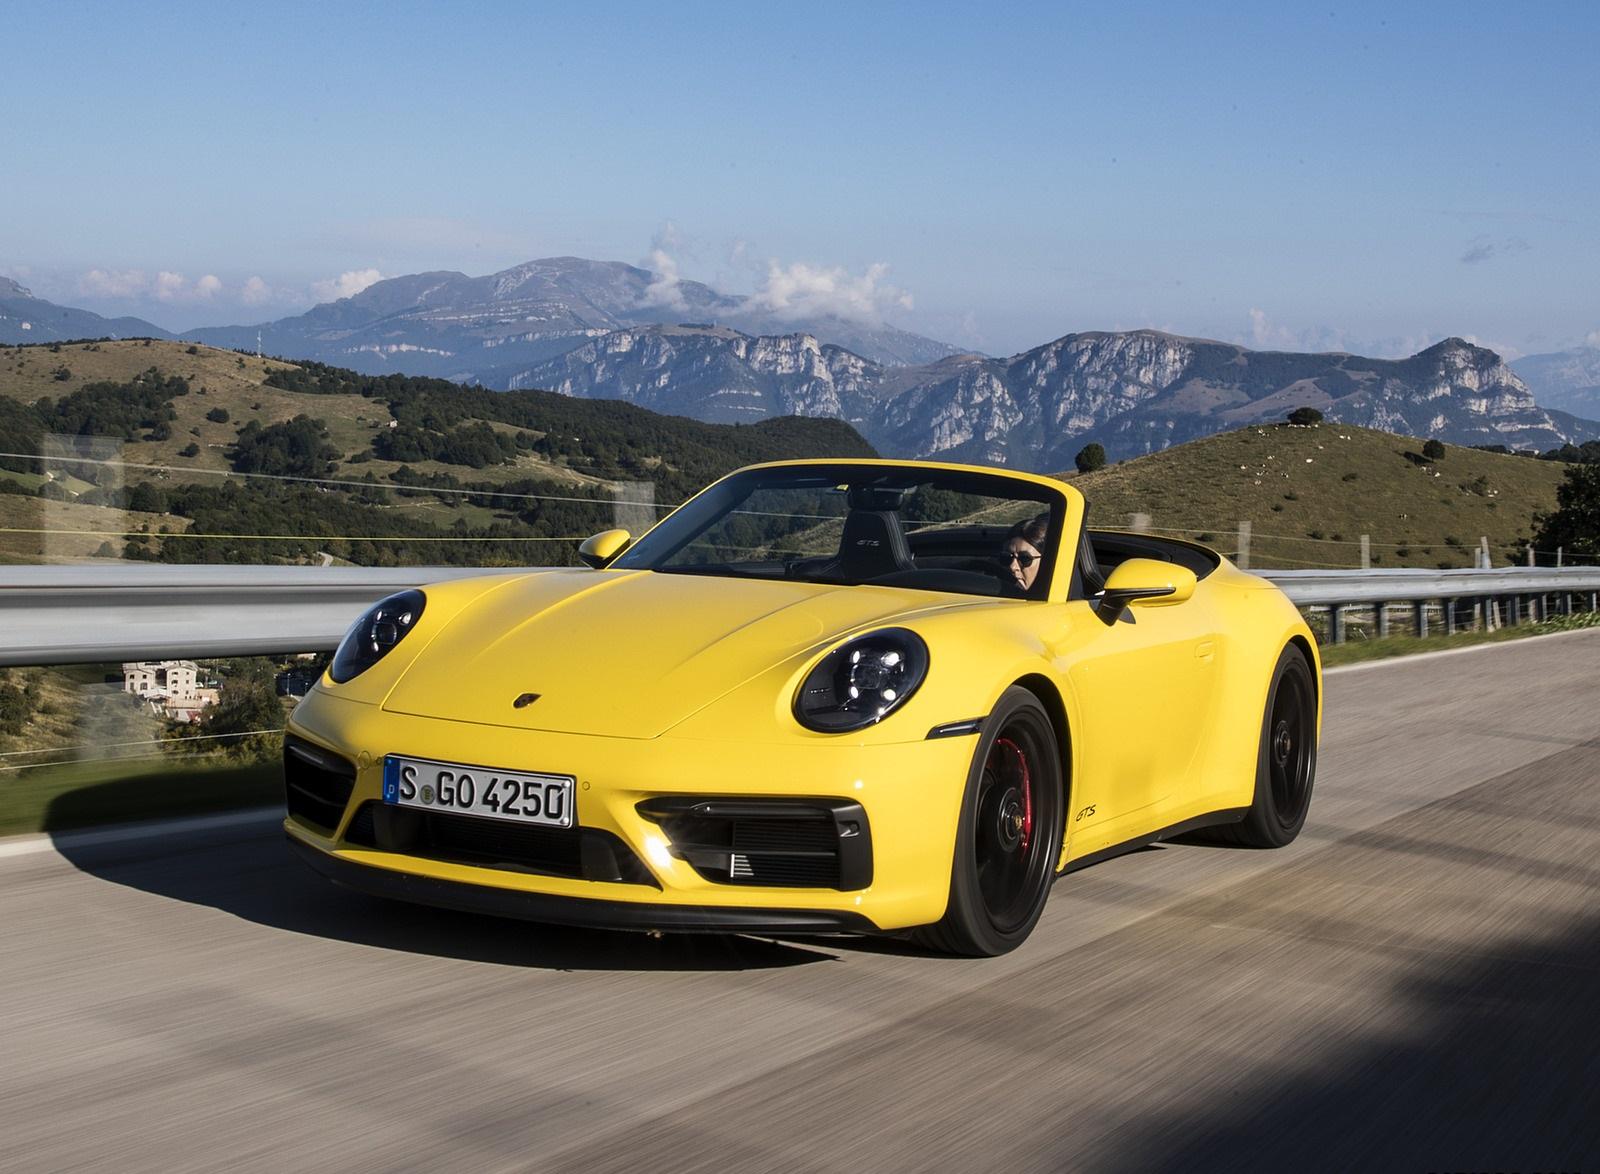 2022 Porsche 911 Carrera GTS Cabriolet (Color: Racing Yellow) Front Three-Quarter Wallpapers (1)